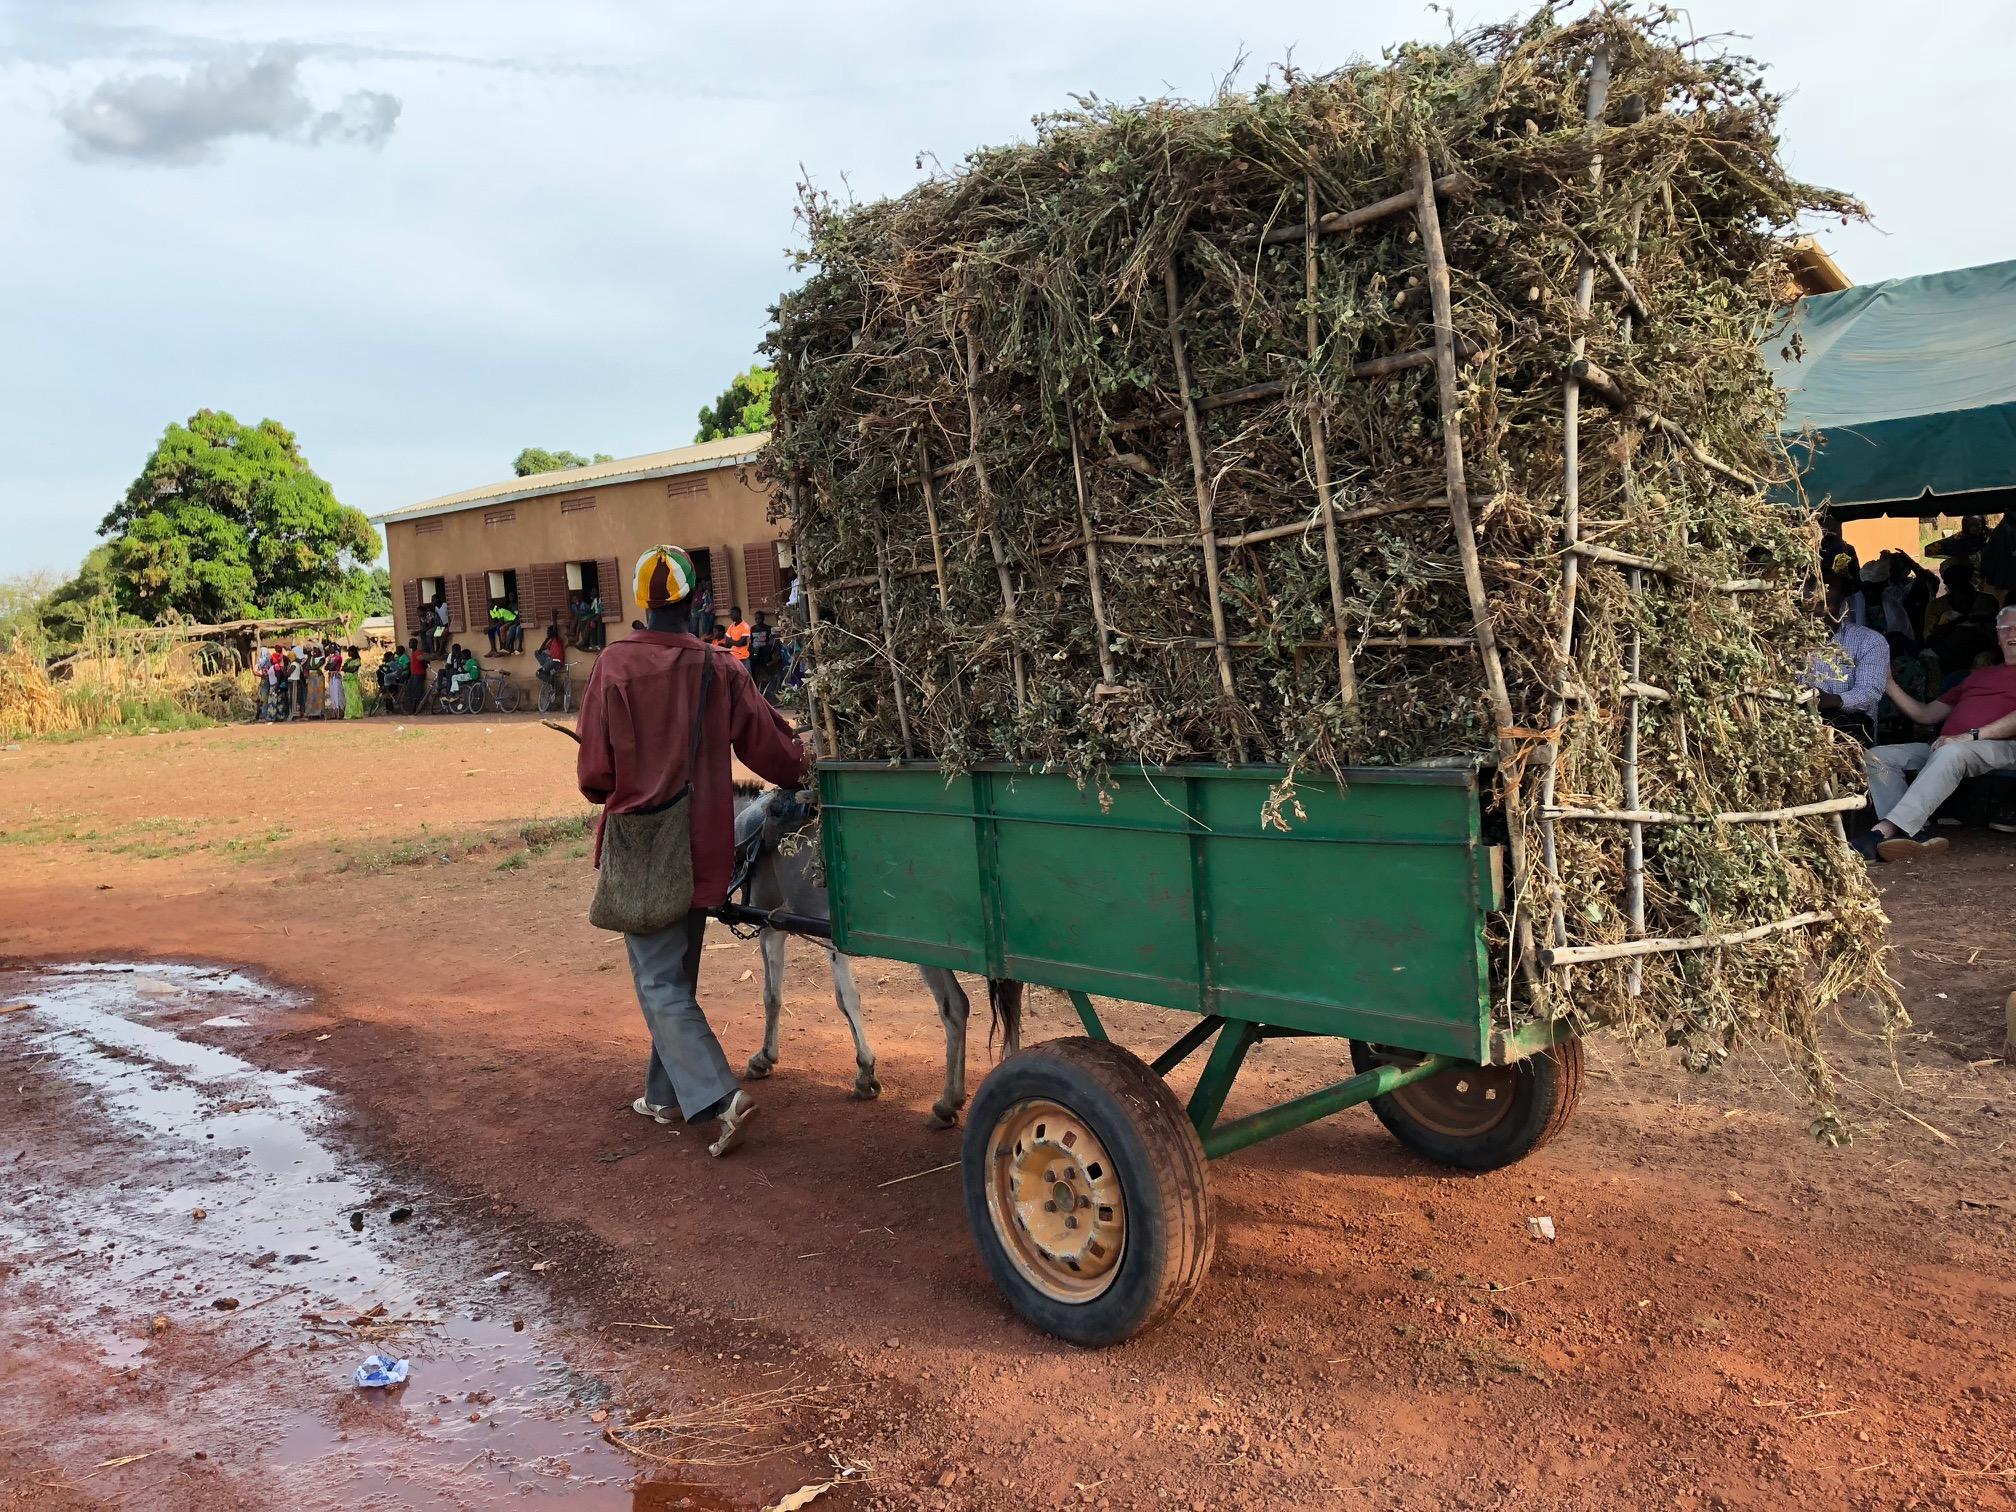 Donkeys do so much work in Mali.